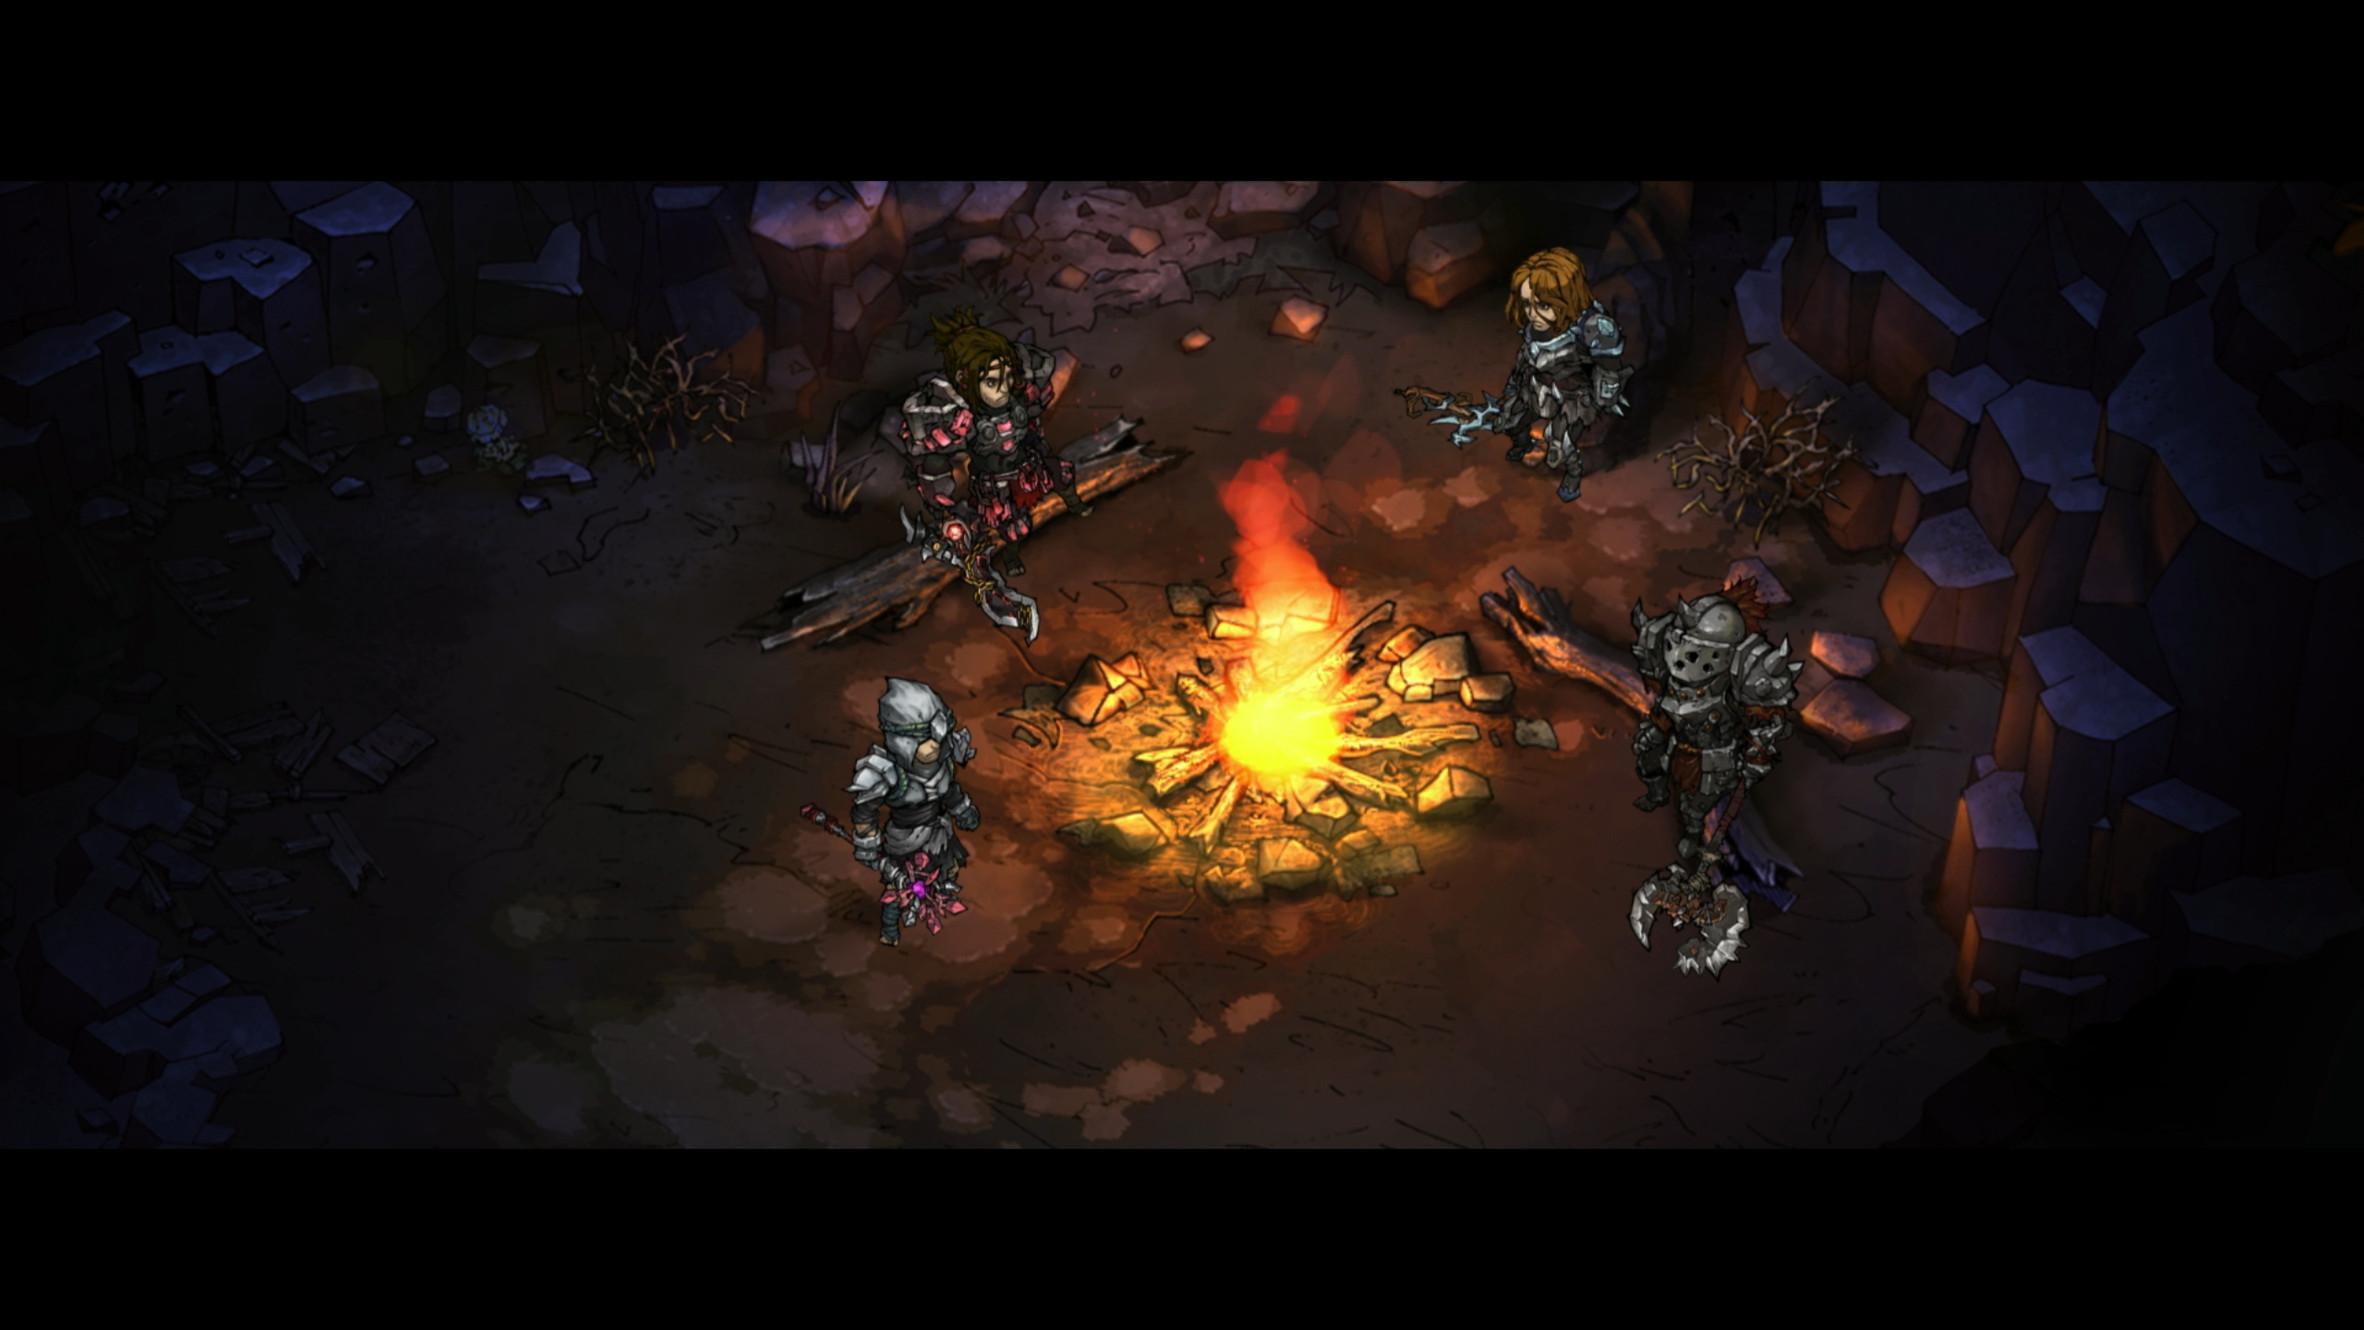 GAMES_ENG | 2D MMORPG | Seoul | JANDISOFT -